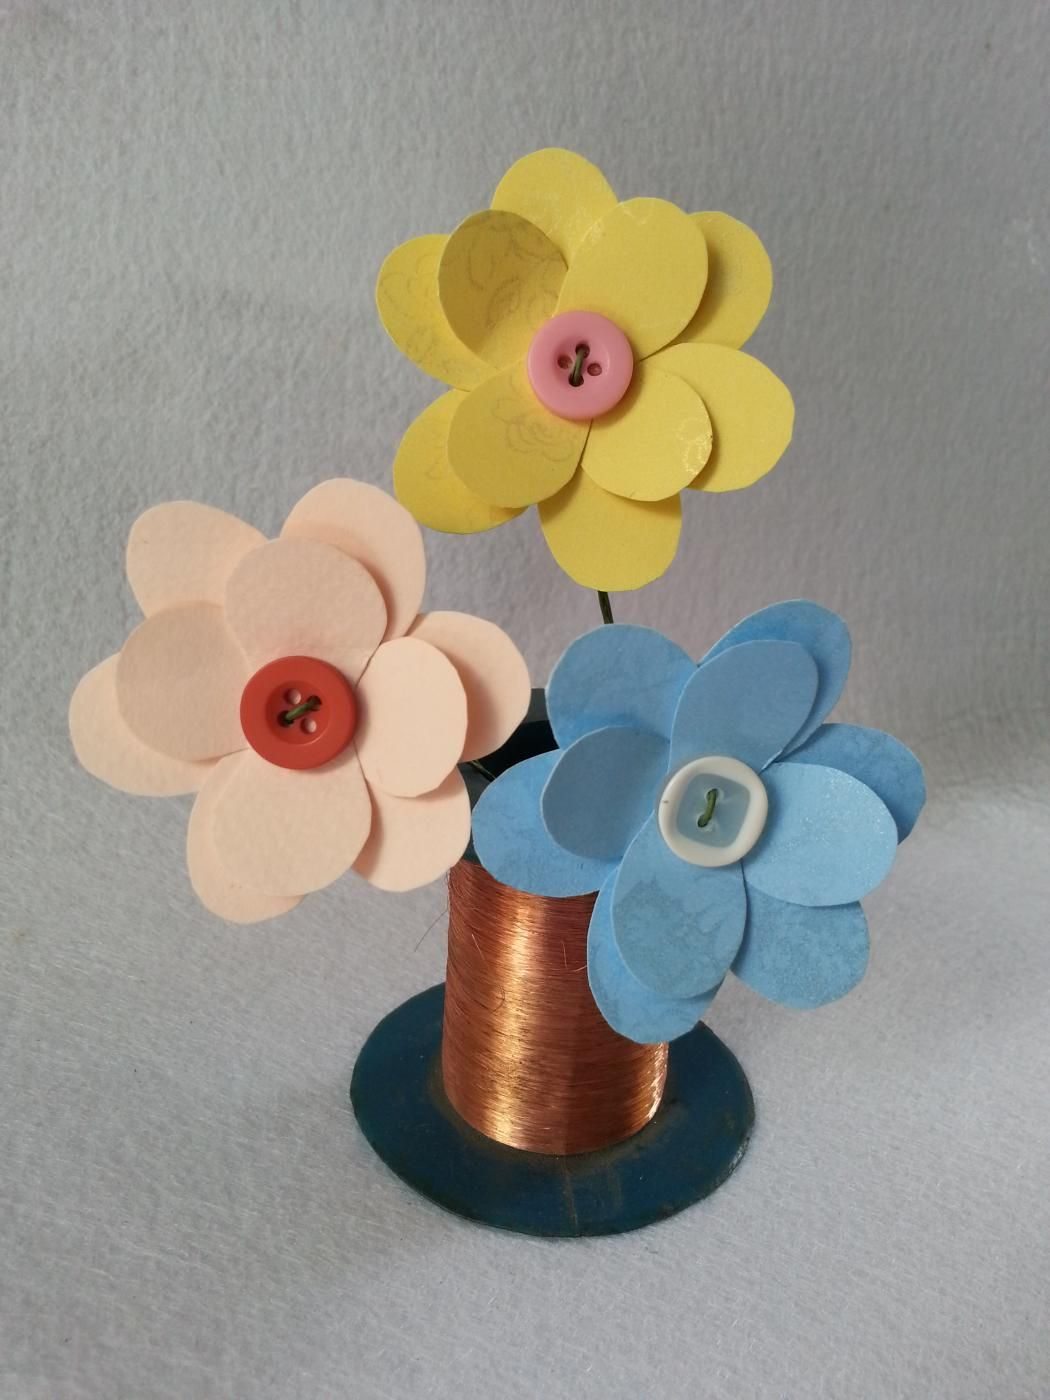 How To Make Paper Flower Diy Paper Pinterest Paper Flower